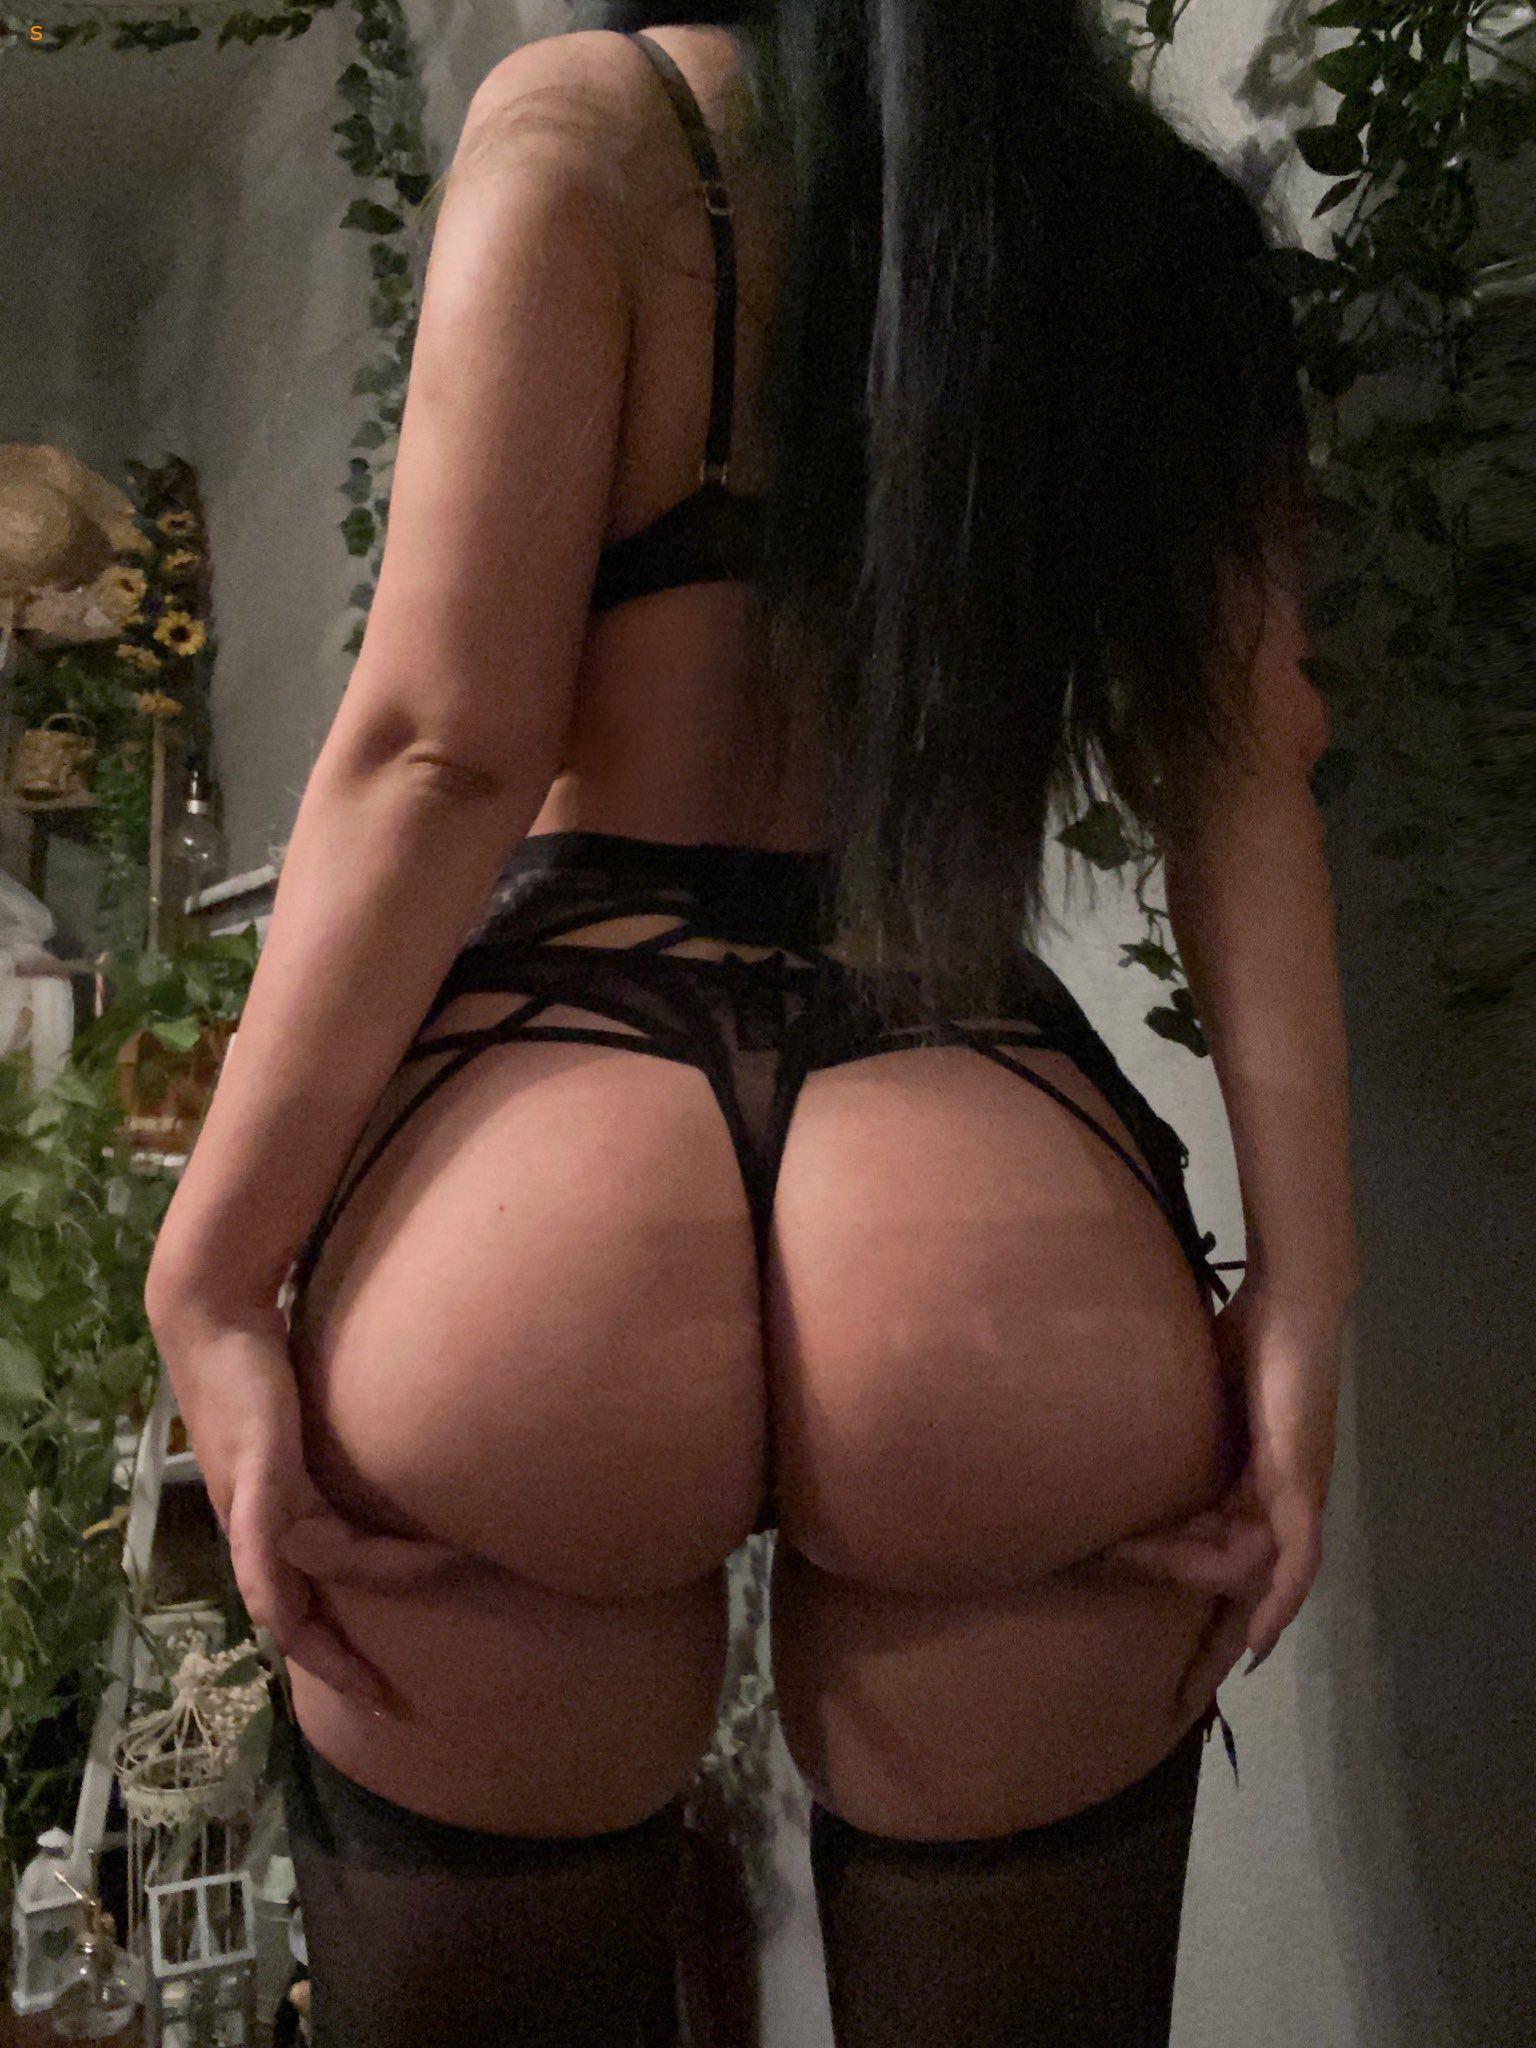 Suculento cuerpo de Maira fotos hot 2